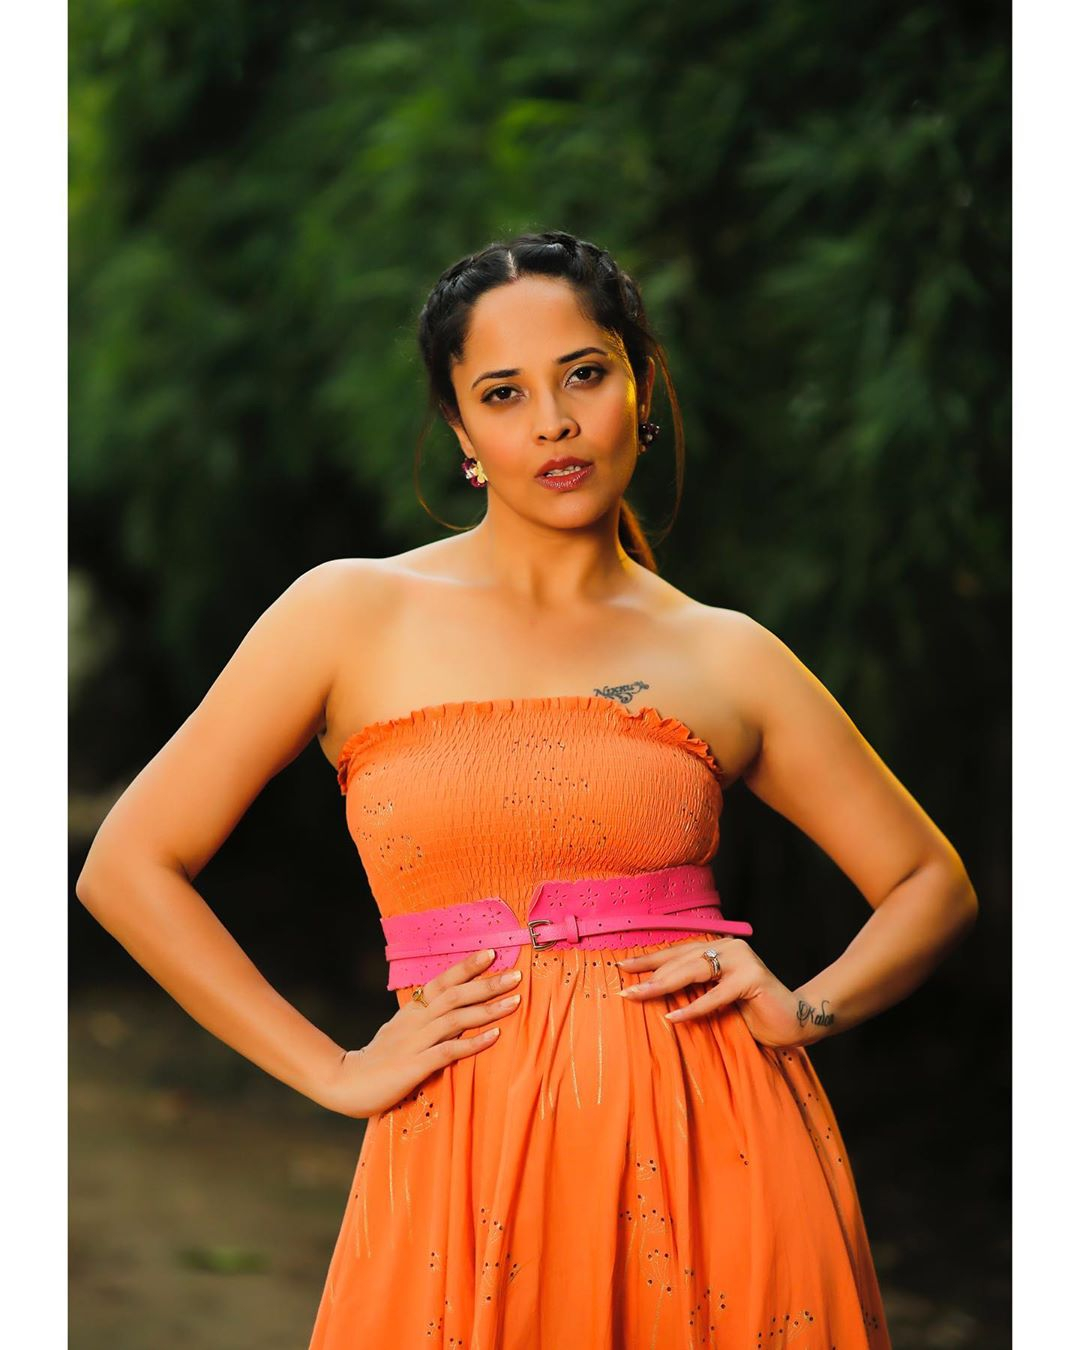 Telugu Anchor Rashmi Gautam Hot Stills - Sexy Hot Images